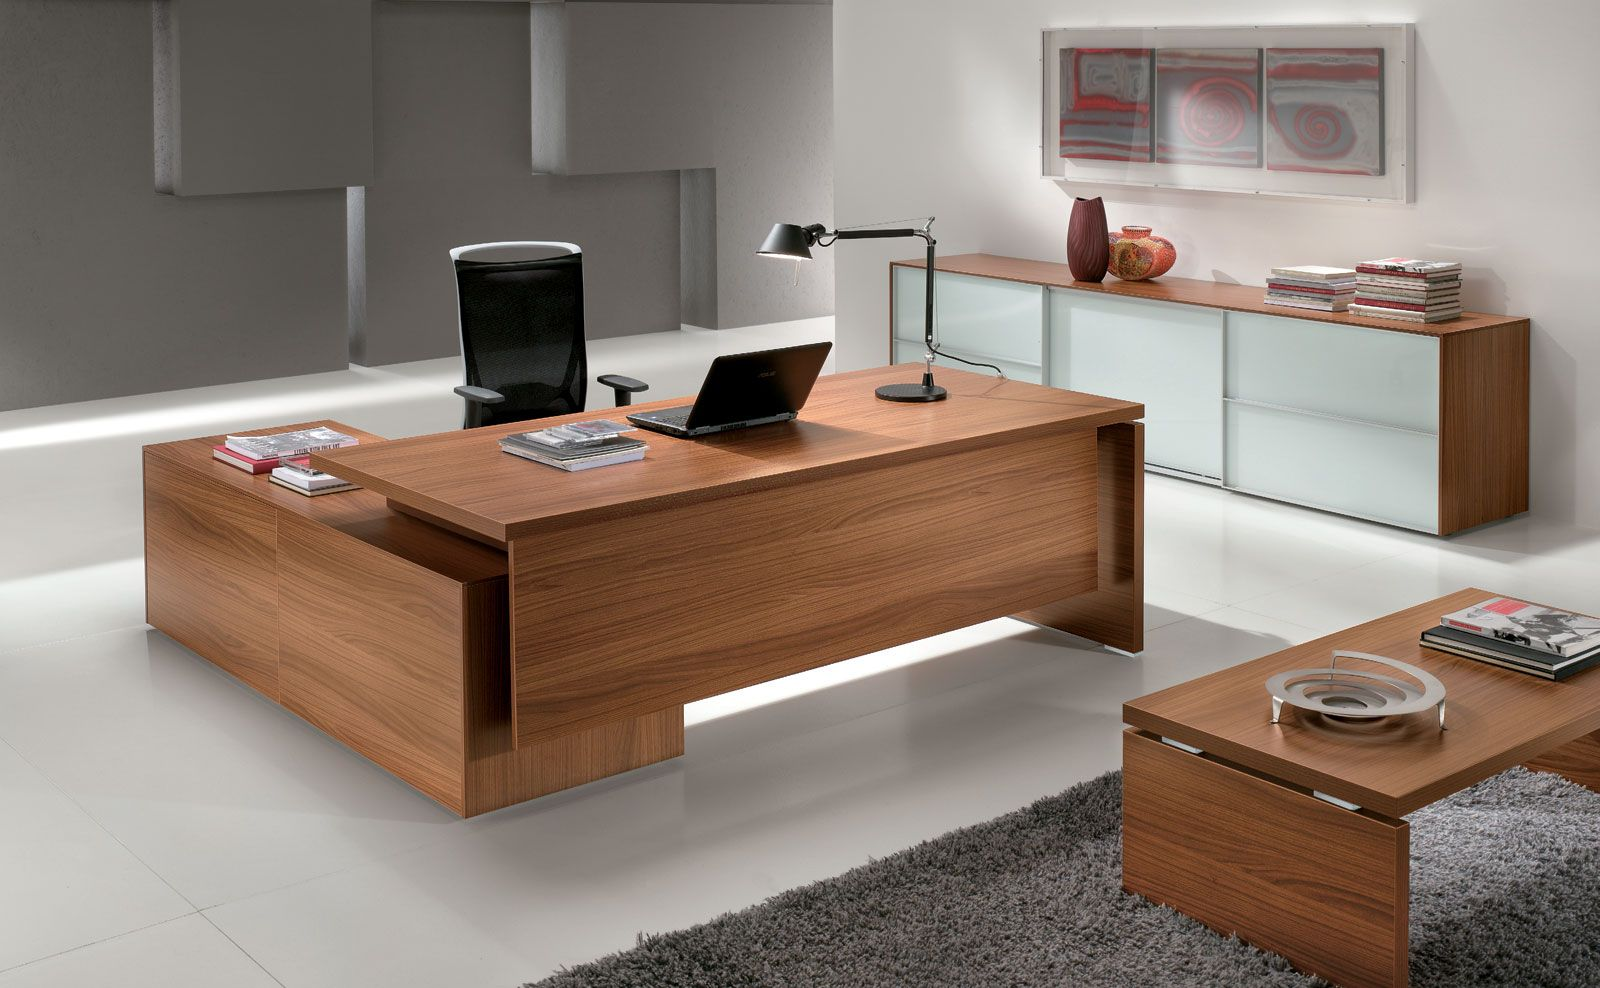 Alea Office Odeon Executive Series 8 Week Lead Time Office Table Design Home Office Design Office Table